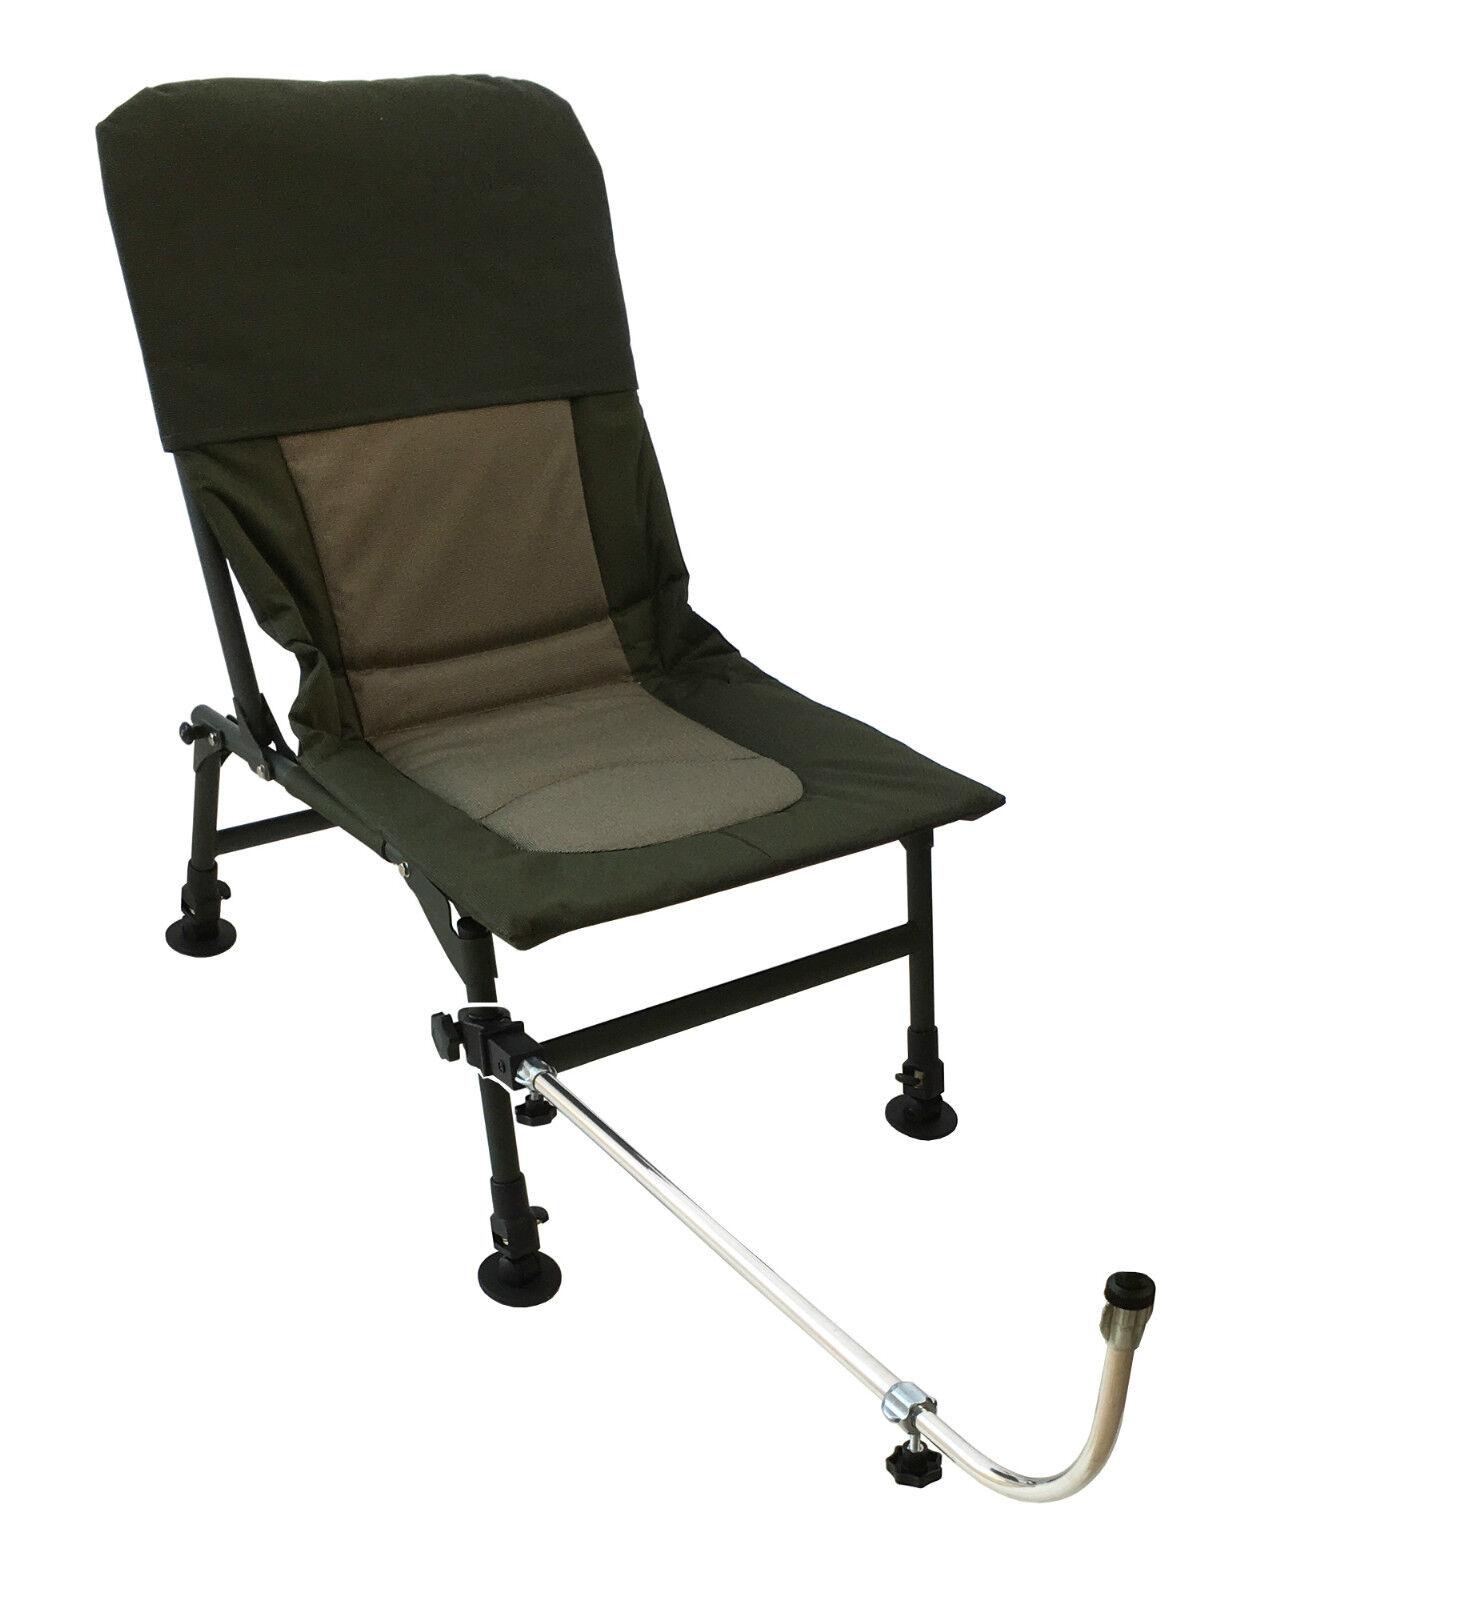 MDI Match Chair Extendable Adjustable Tilt Fishing Feeder-Method Arm Rest